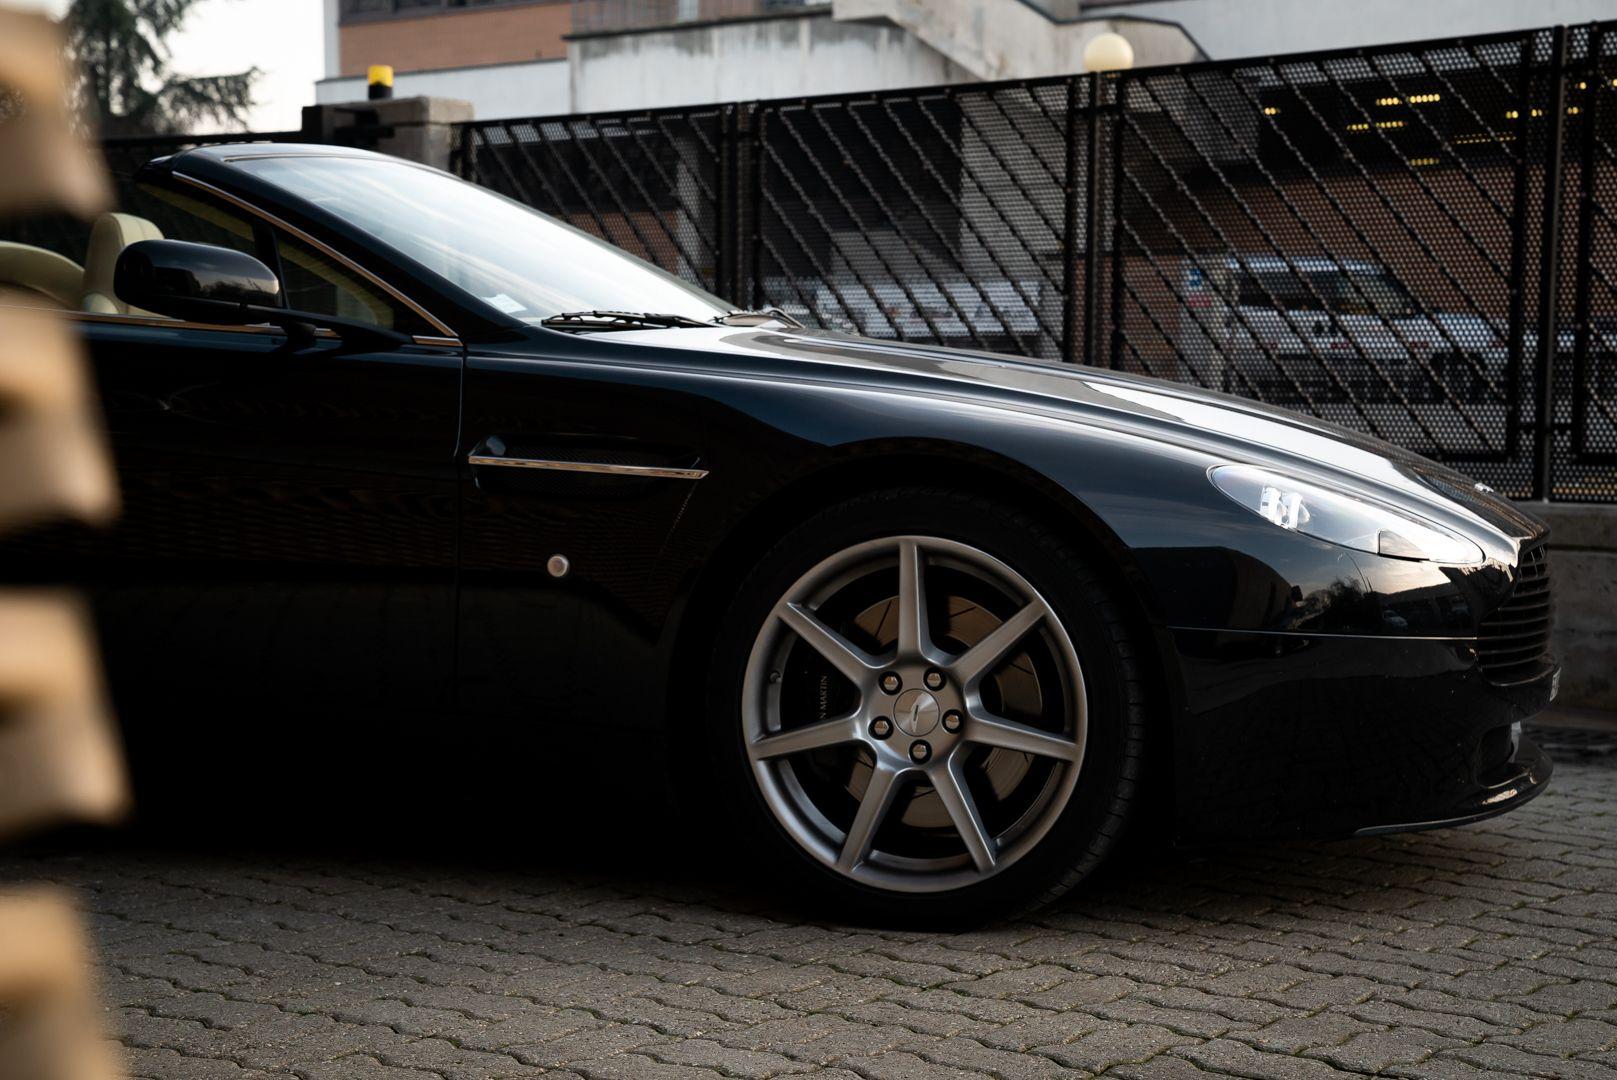 2008 Aston Martin 4.3 V8 Vantage Roadster N400 82800